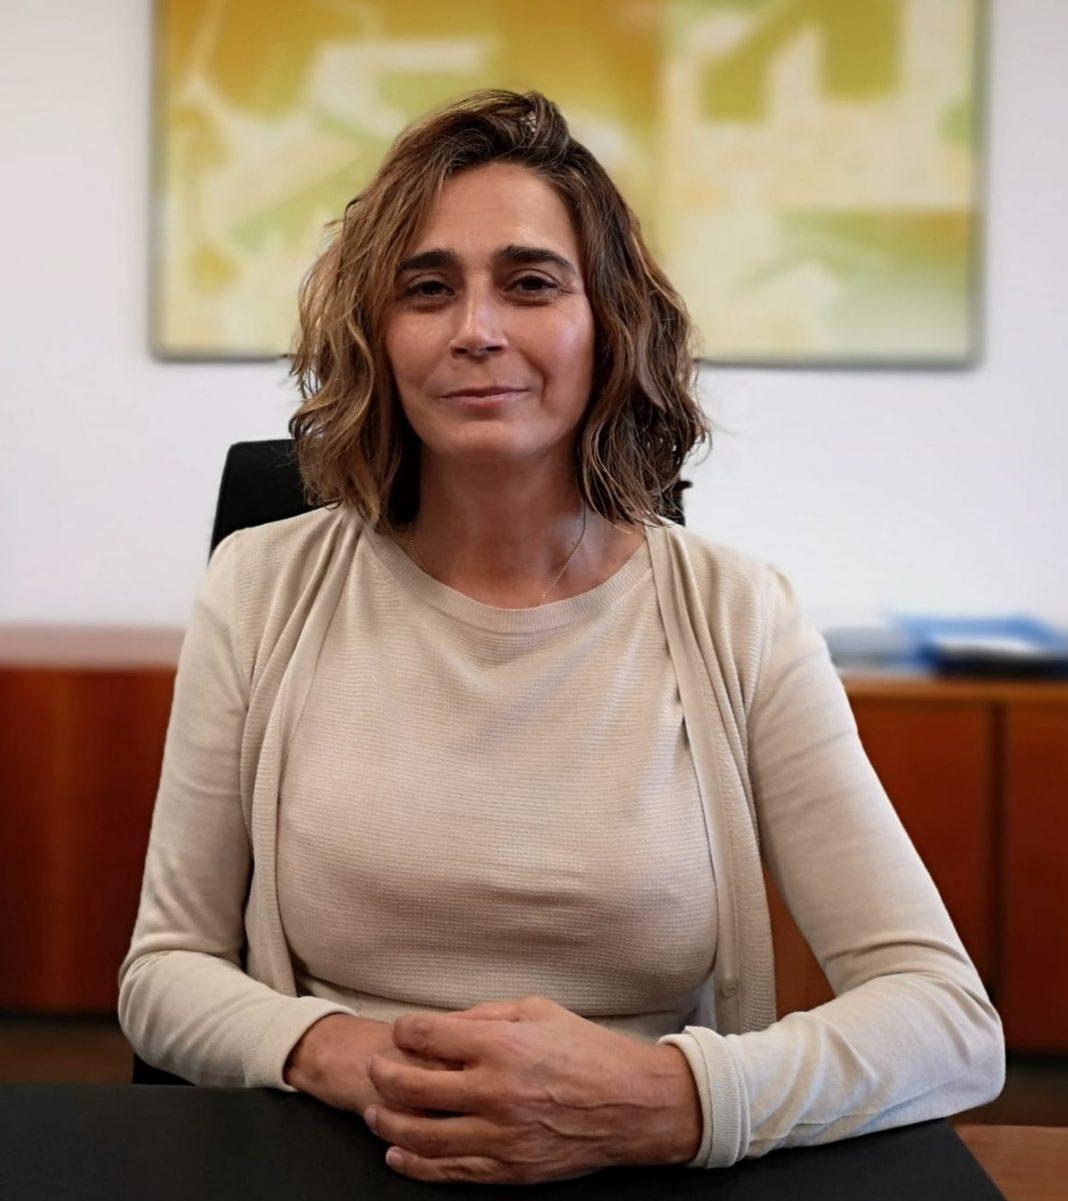 Alicia Paz Antolin